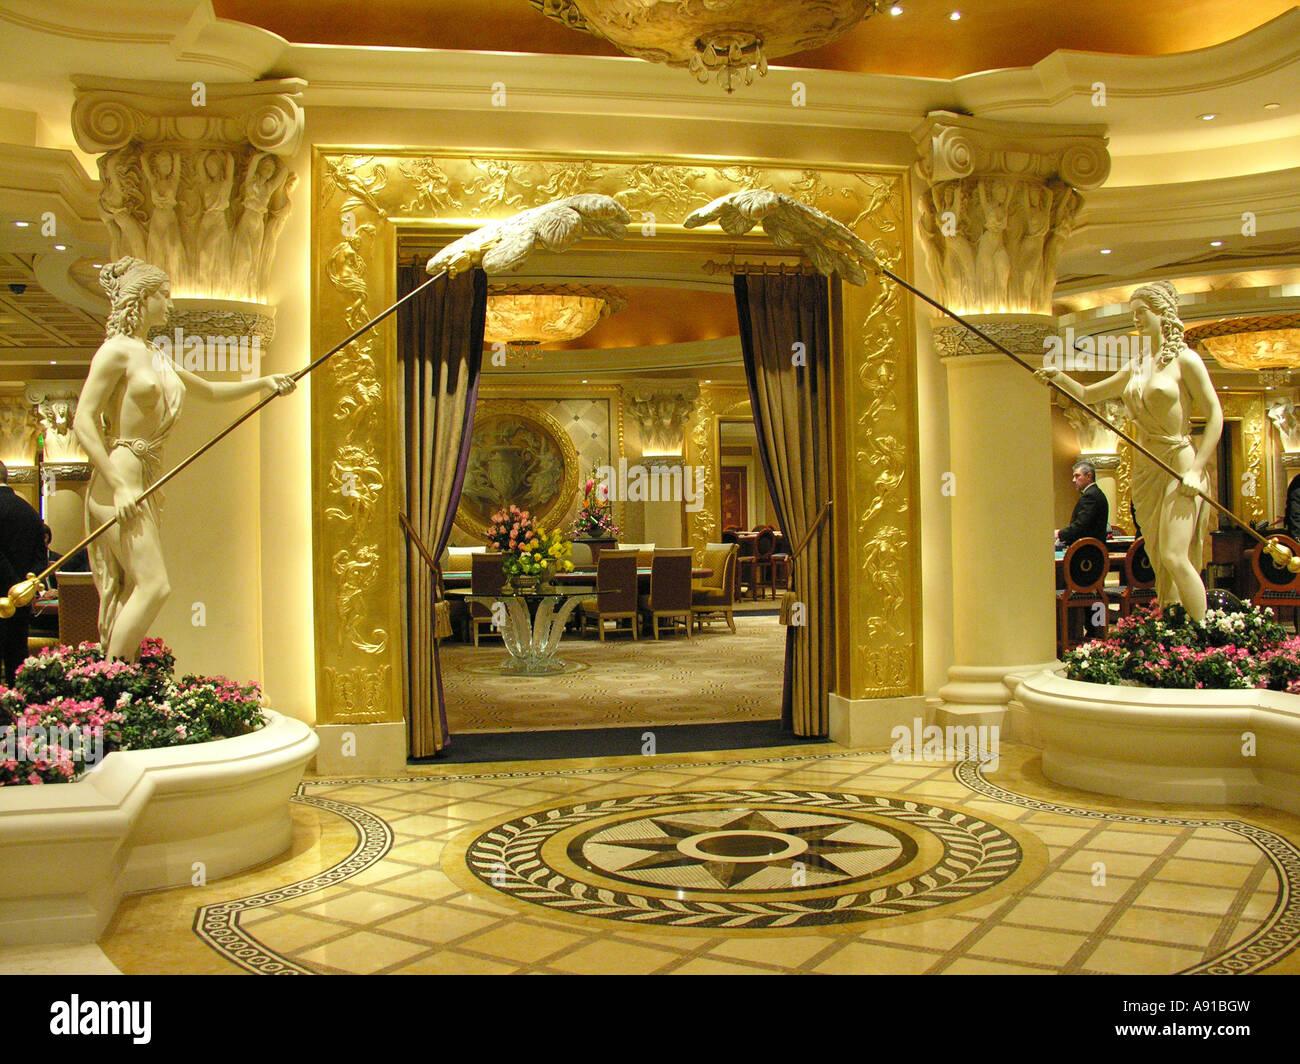 roman style ornate interior decor Stock Photo Royalty Free Image